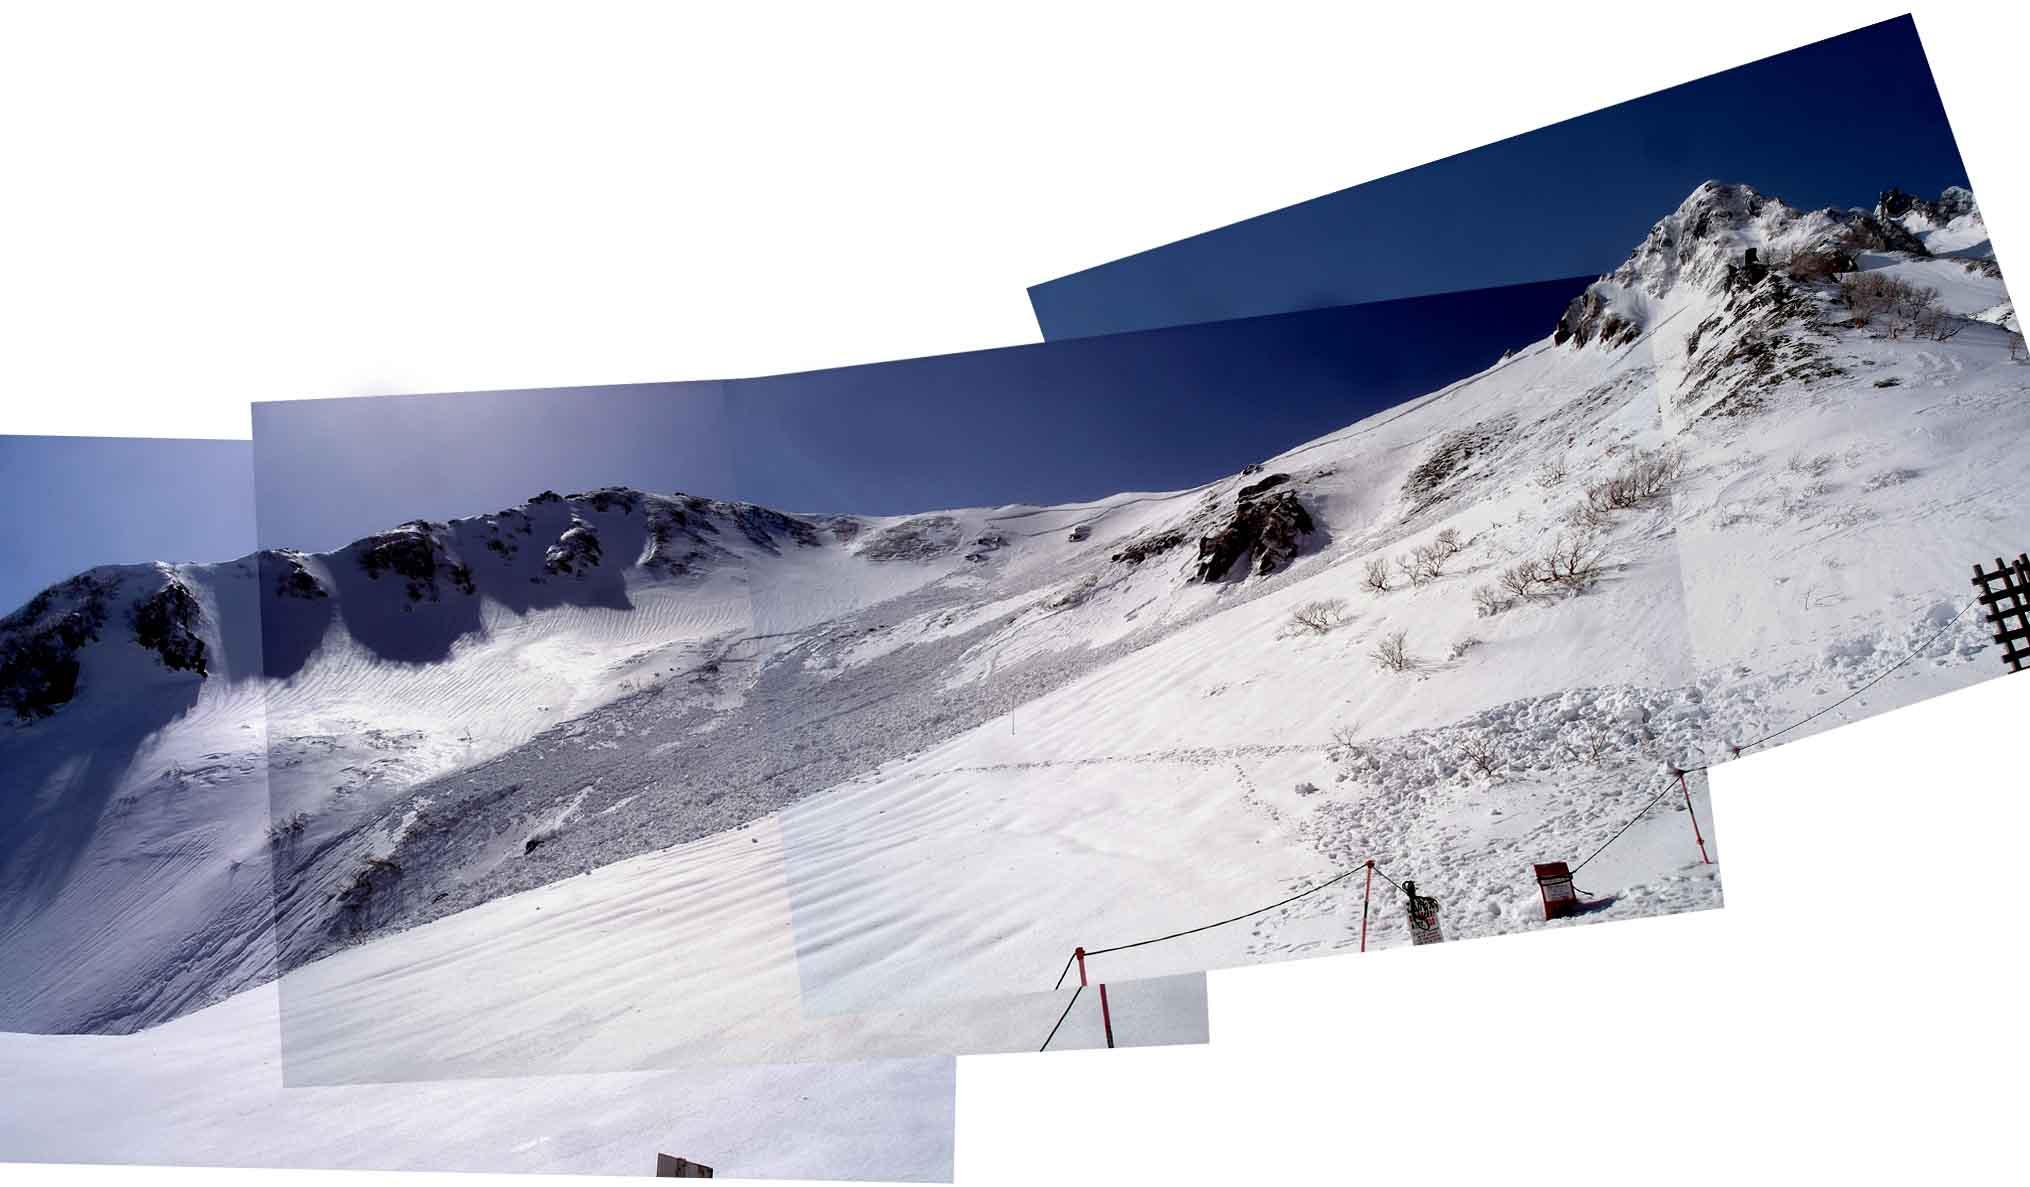 14日 極楽平下部の雪崩跡